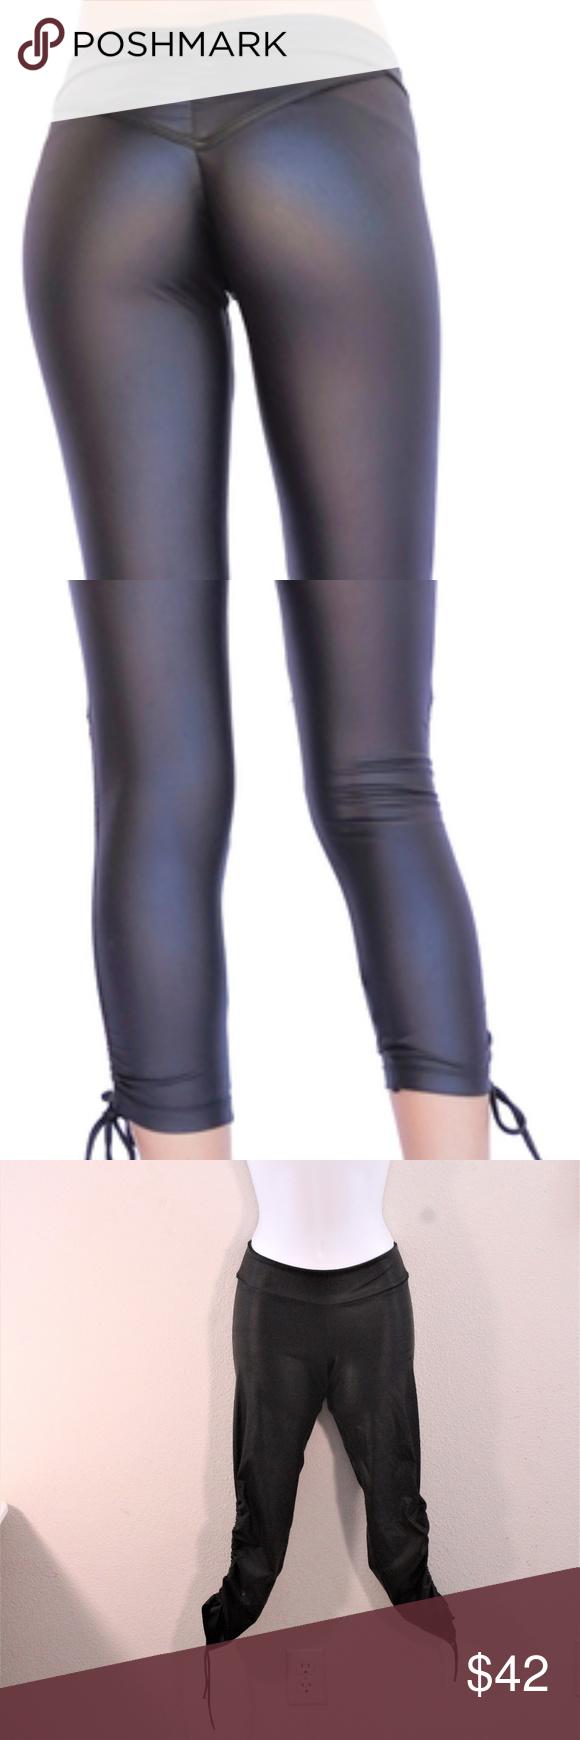 4e6102b1d6193 Mia Brazilia Wet Look Scrunch Athletic Leggings Mia Brazilia Wet Look  Scrunch Athletic Leggings Amazing Bamboo Supplex blend Black Leather Look  Fabric ...